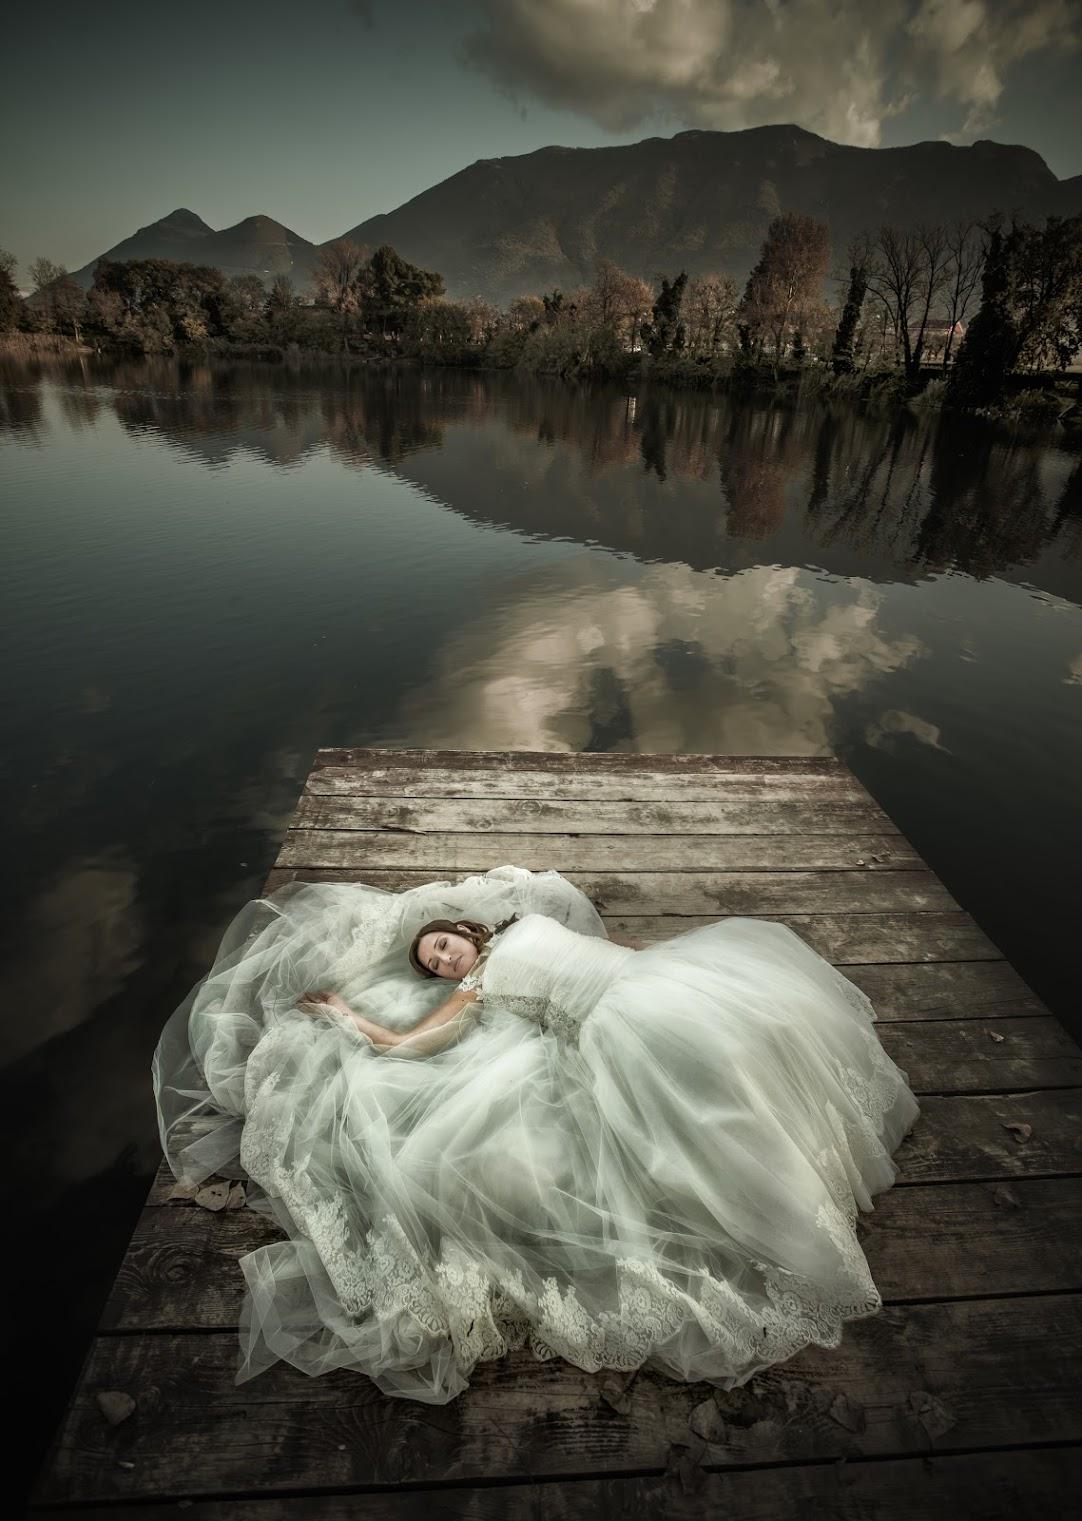 Fotografo Cava Dei Tirreni enzo gigantino (enzogigantino), a wedding photographer in